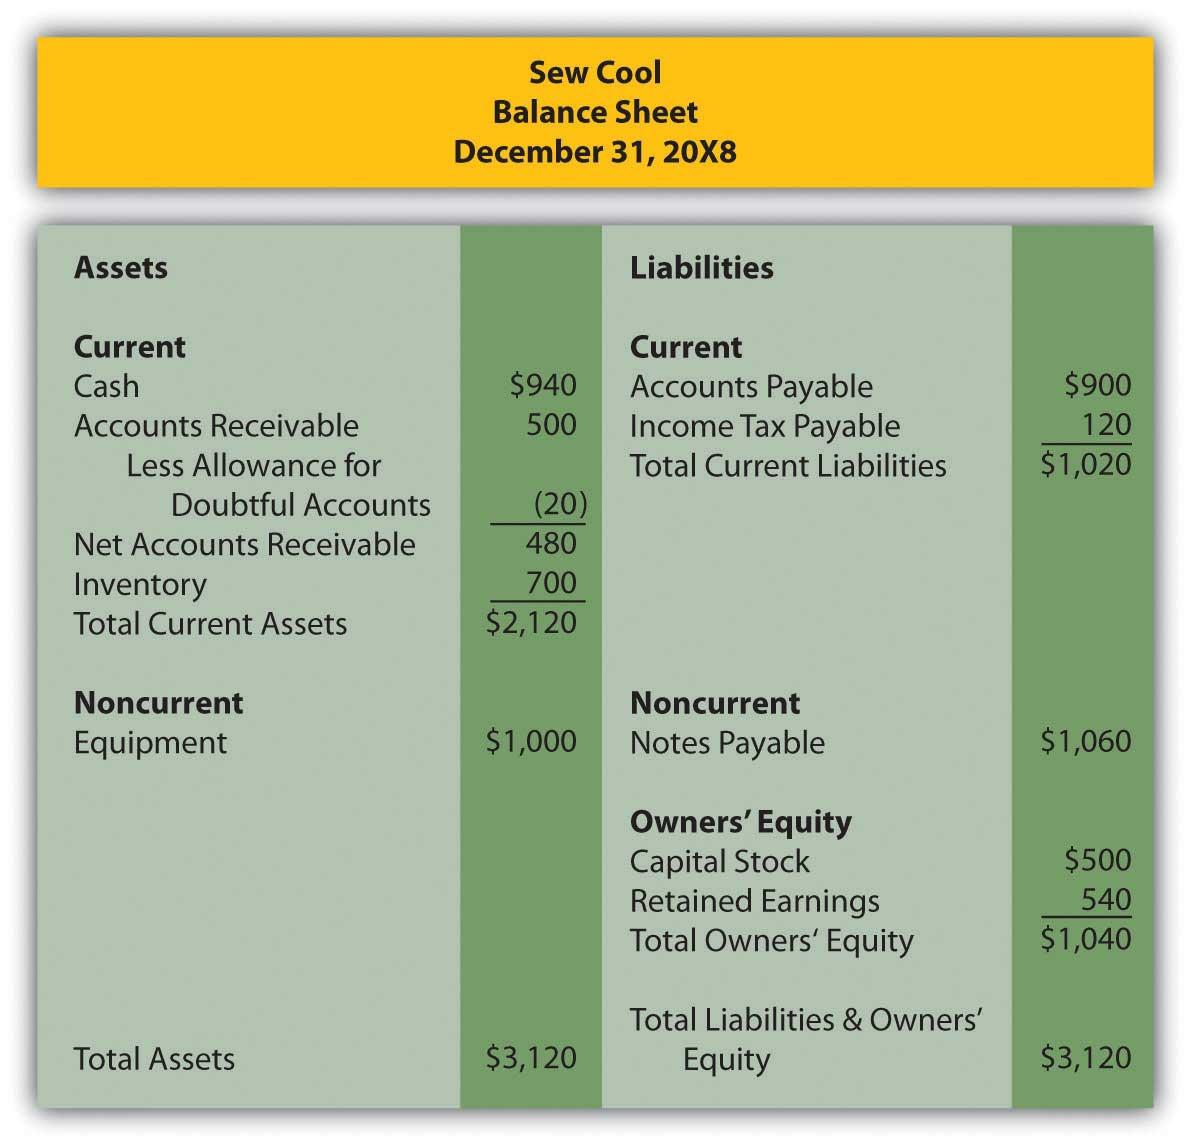 sew cool's balance sheet